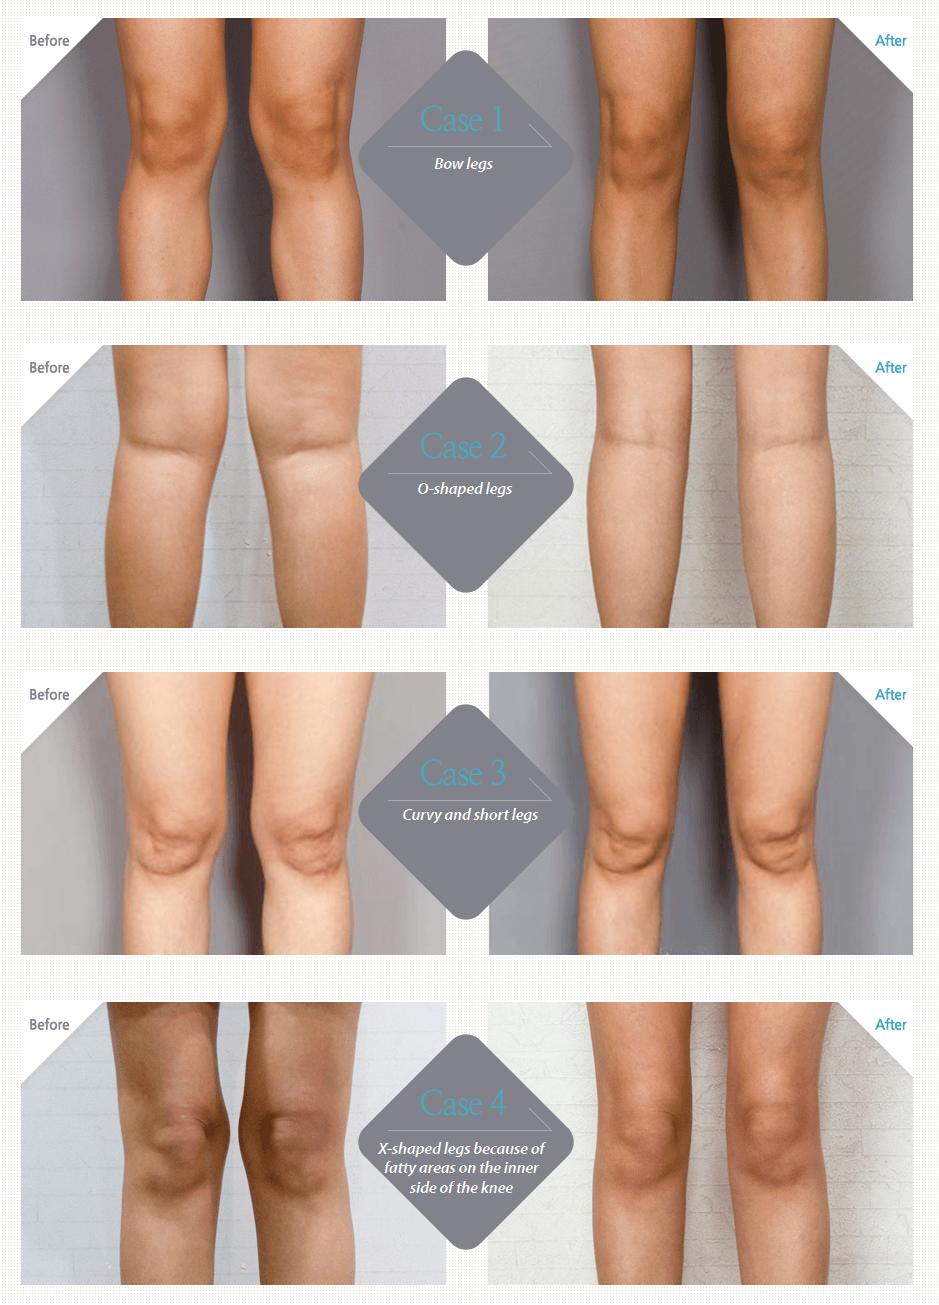 Chanel Line Liposuction_image 5